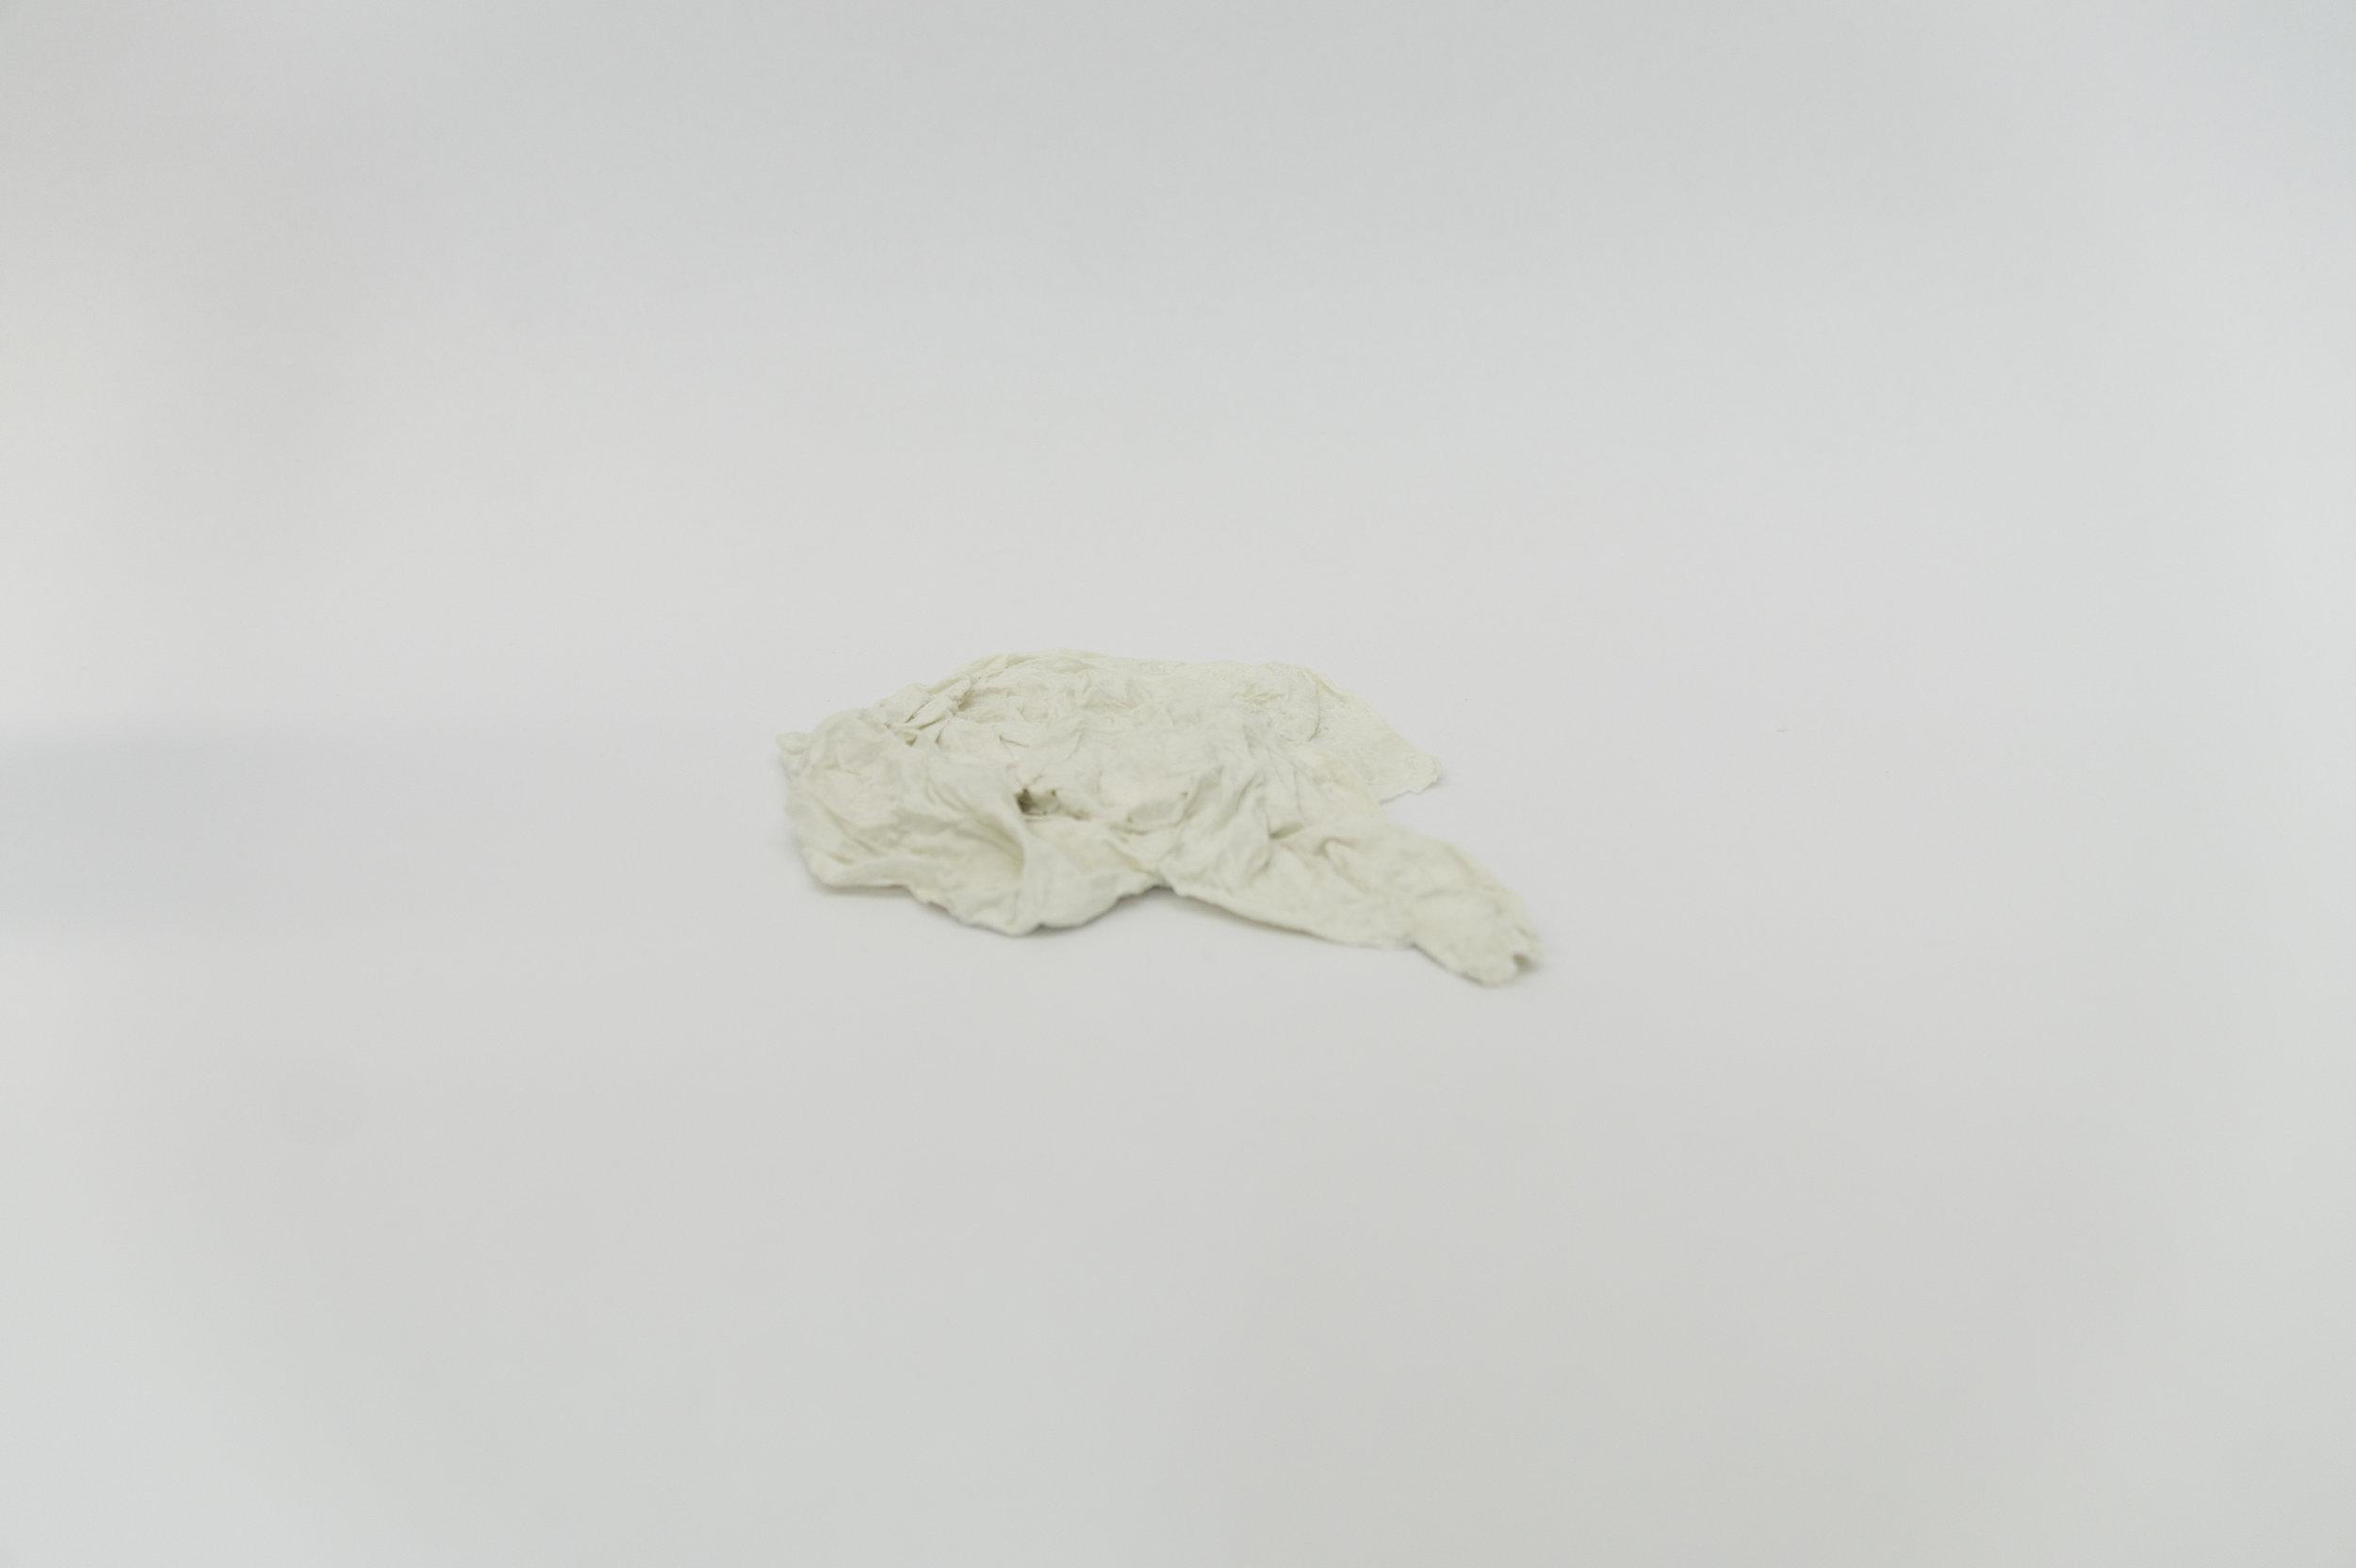 Untitled 7 (Porcelain Paper Towel)